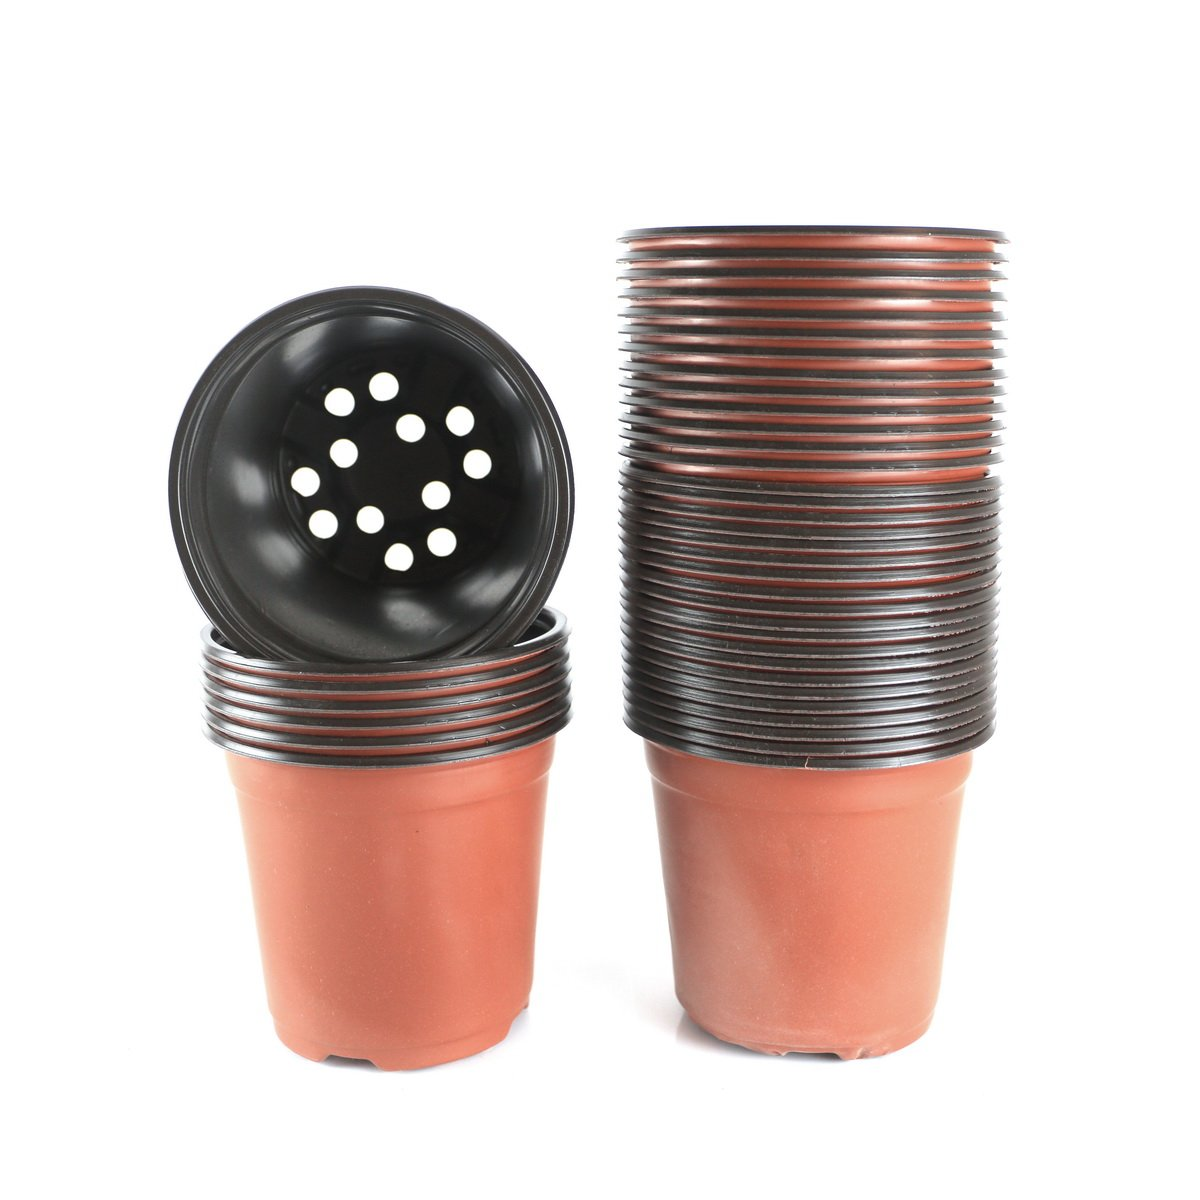 Truedays 6 Inch Plastic Flower Seedlings Nursery Supplies Planter Pot Pots Containers 40 Pack